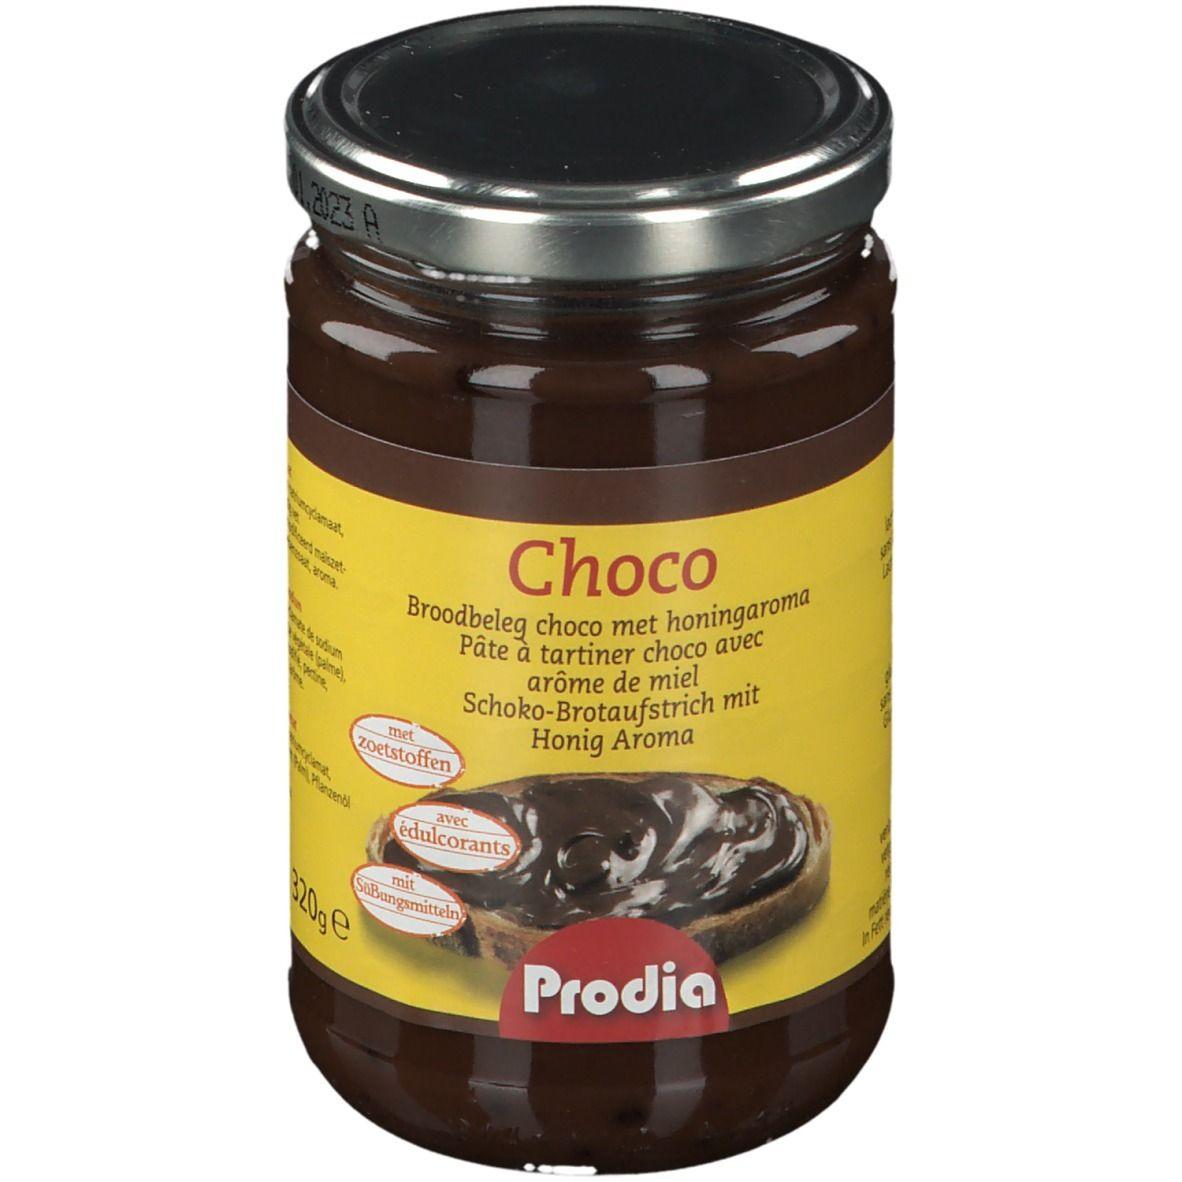 Prodia Pâte à tartiner - Choco avec arôme miel g crème